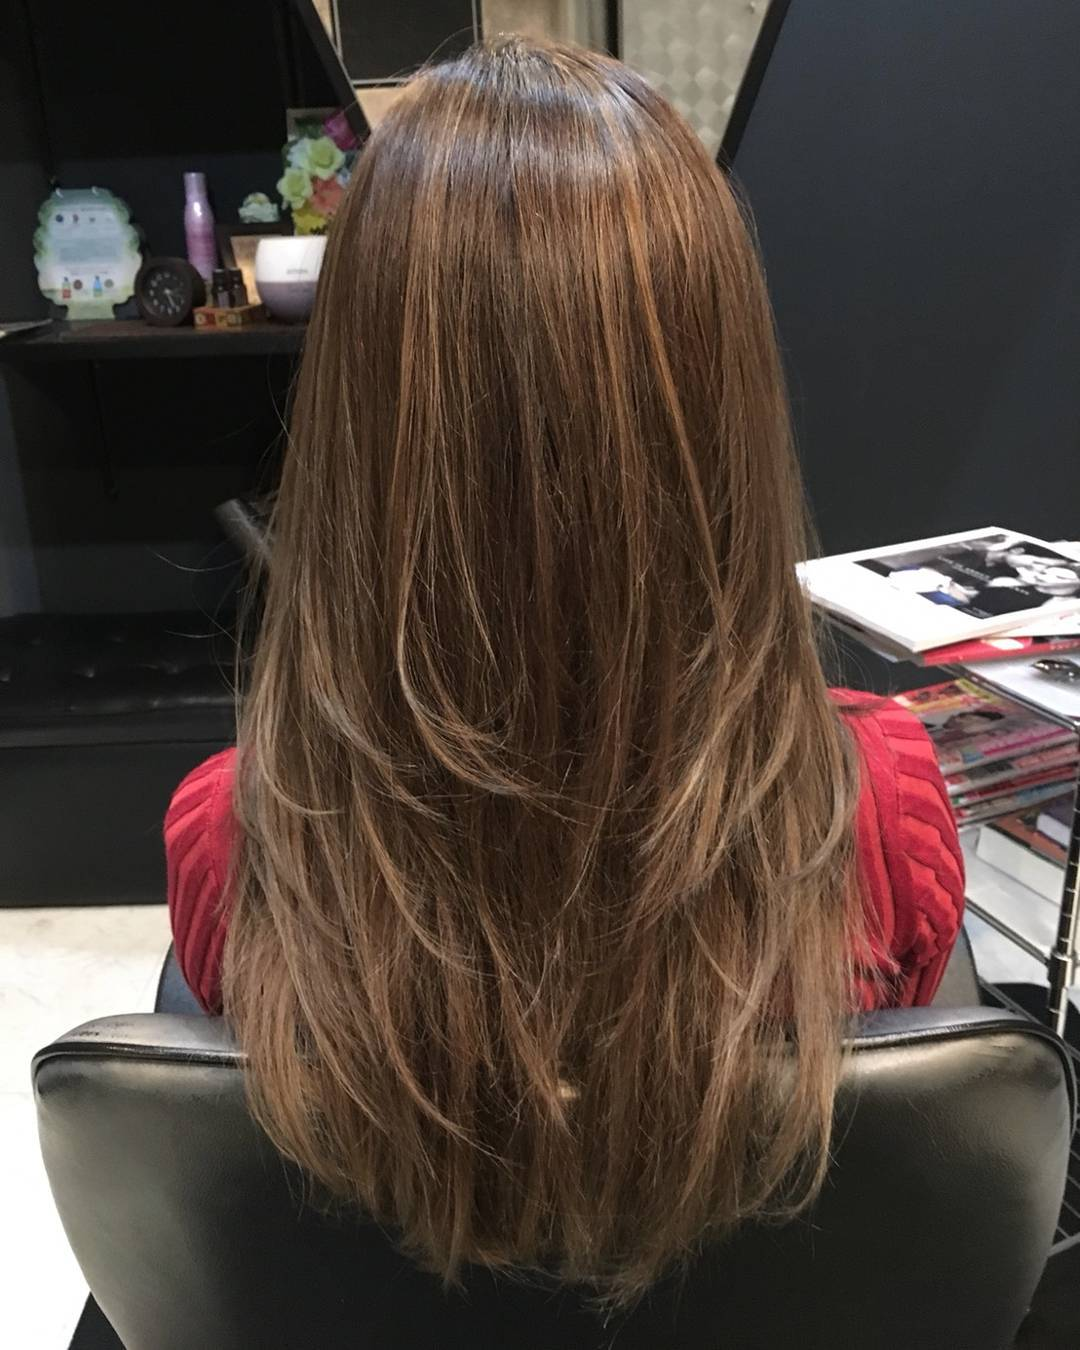 http://beauty-salon-la-alegria-ubecity.com/news/323.jpg